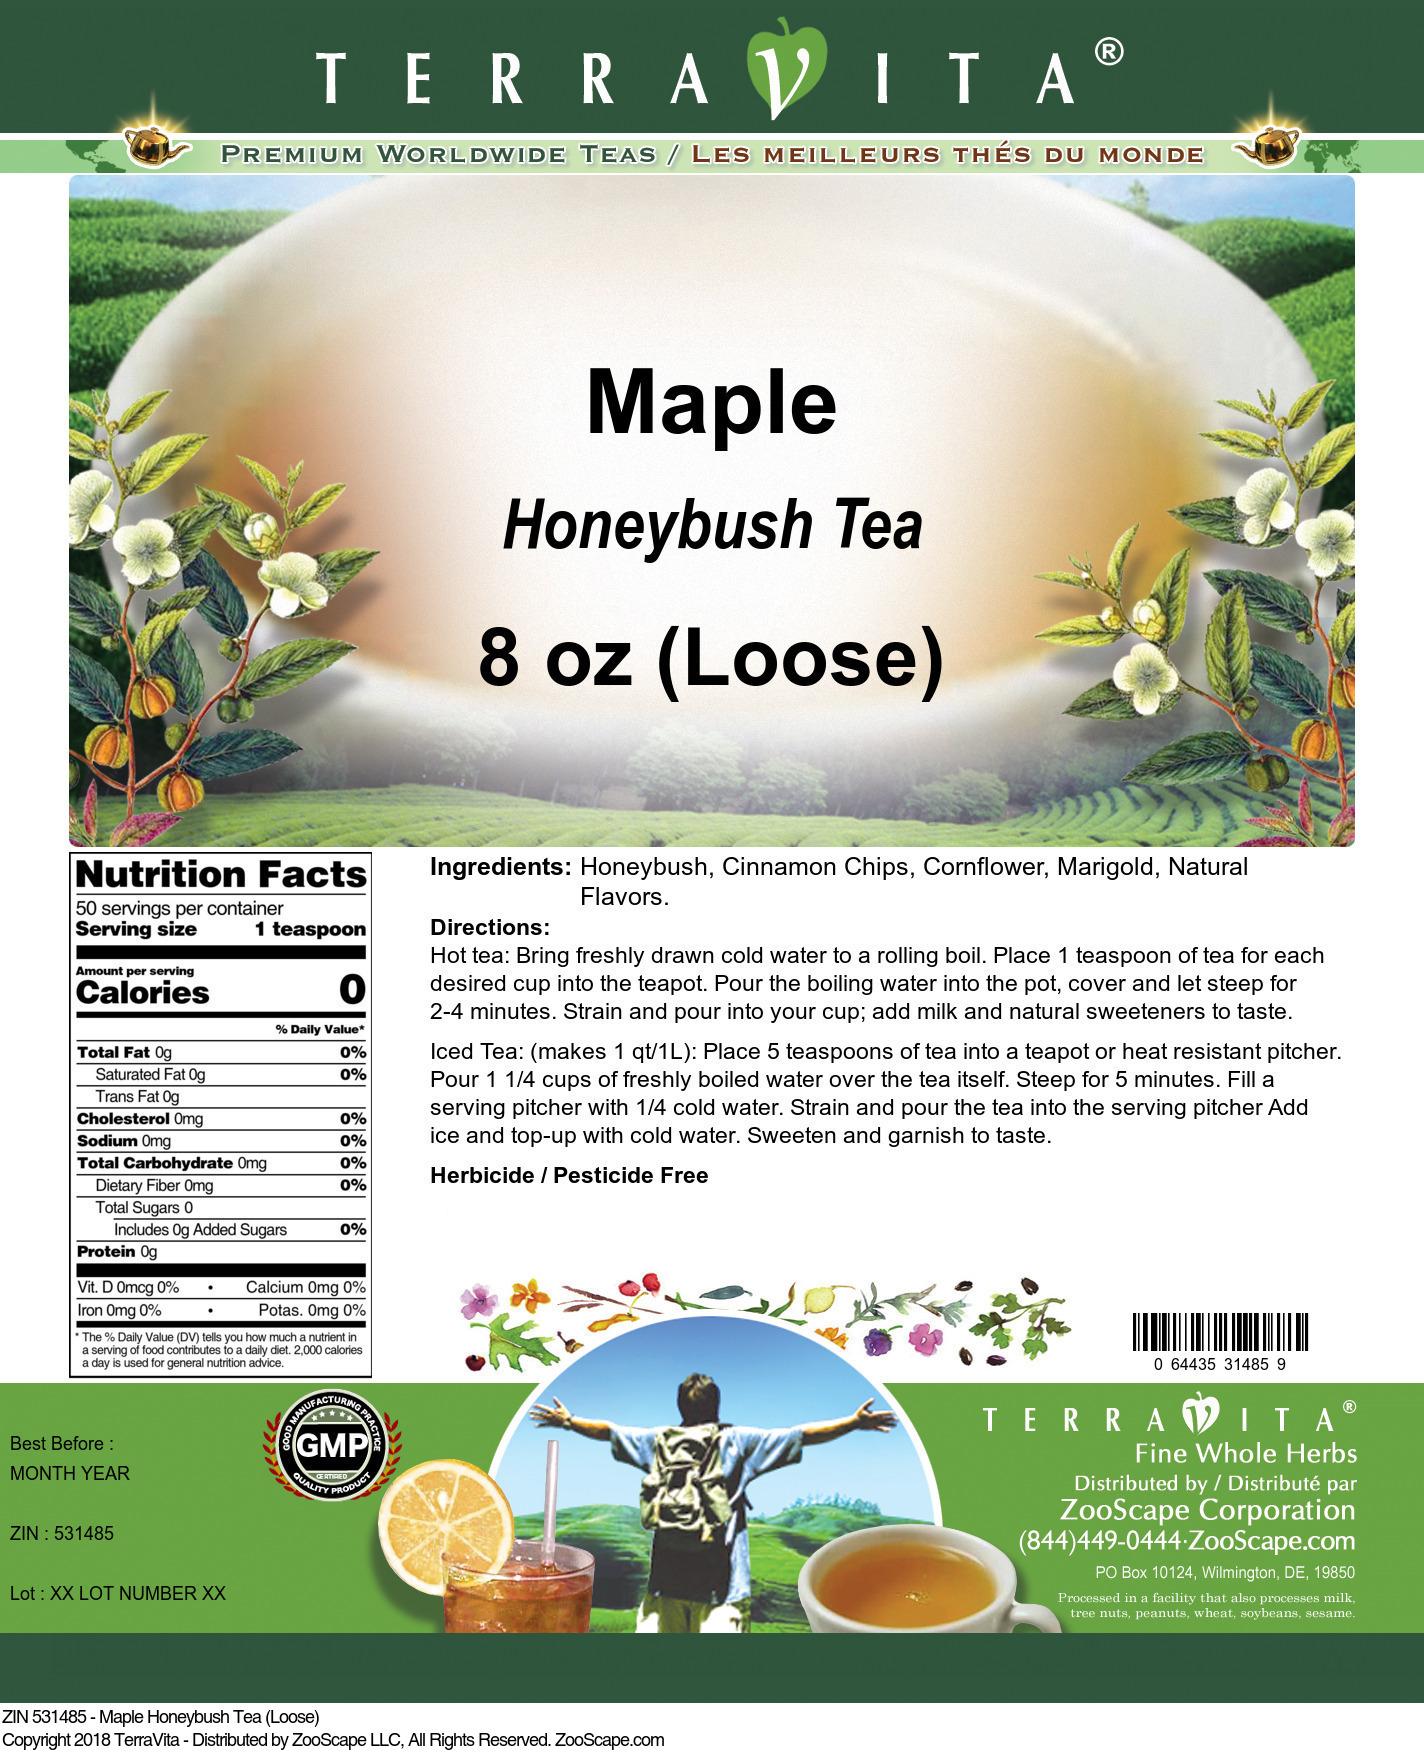 Maple Honeybush Tea (Loose)